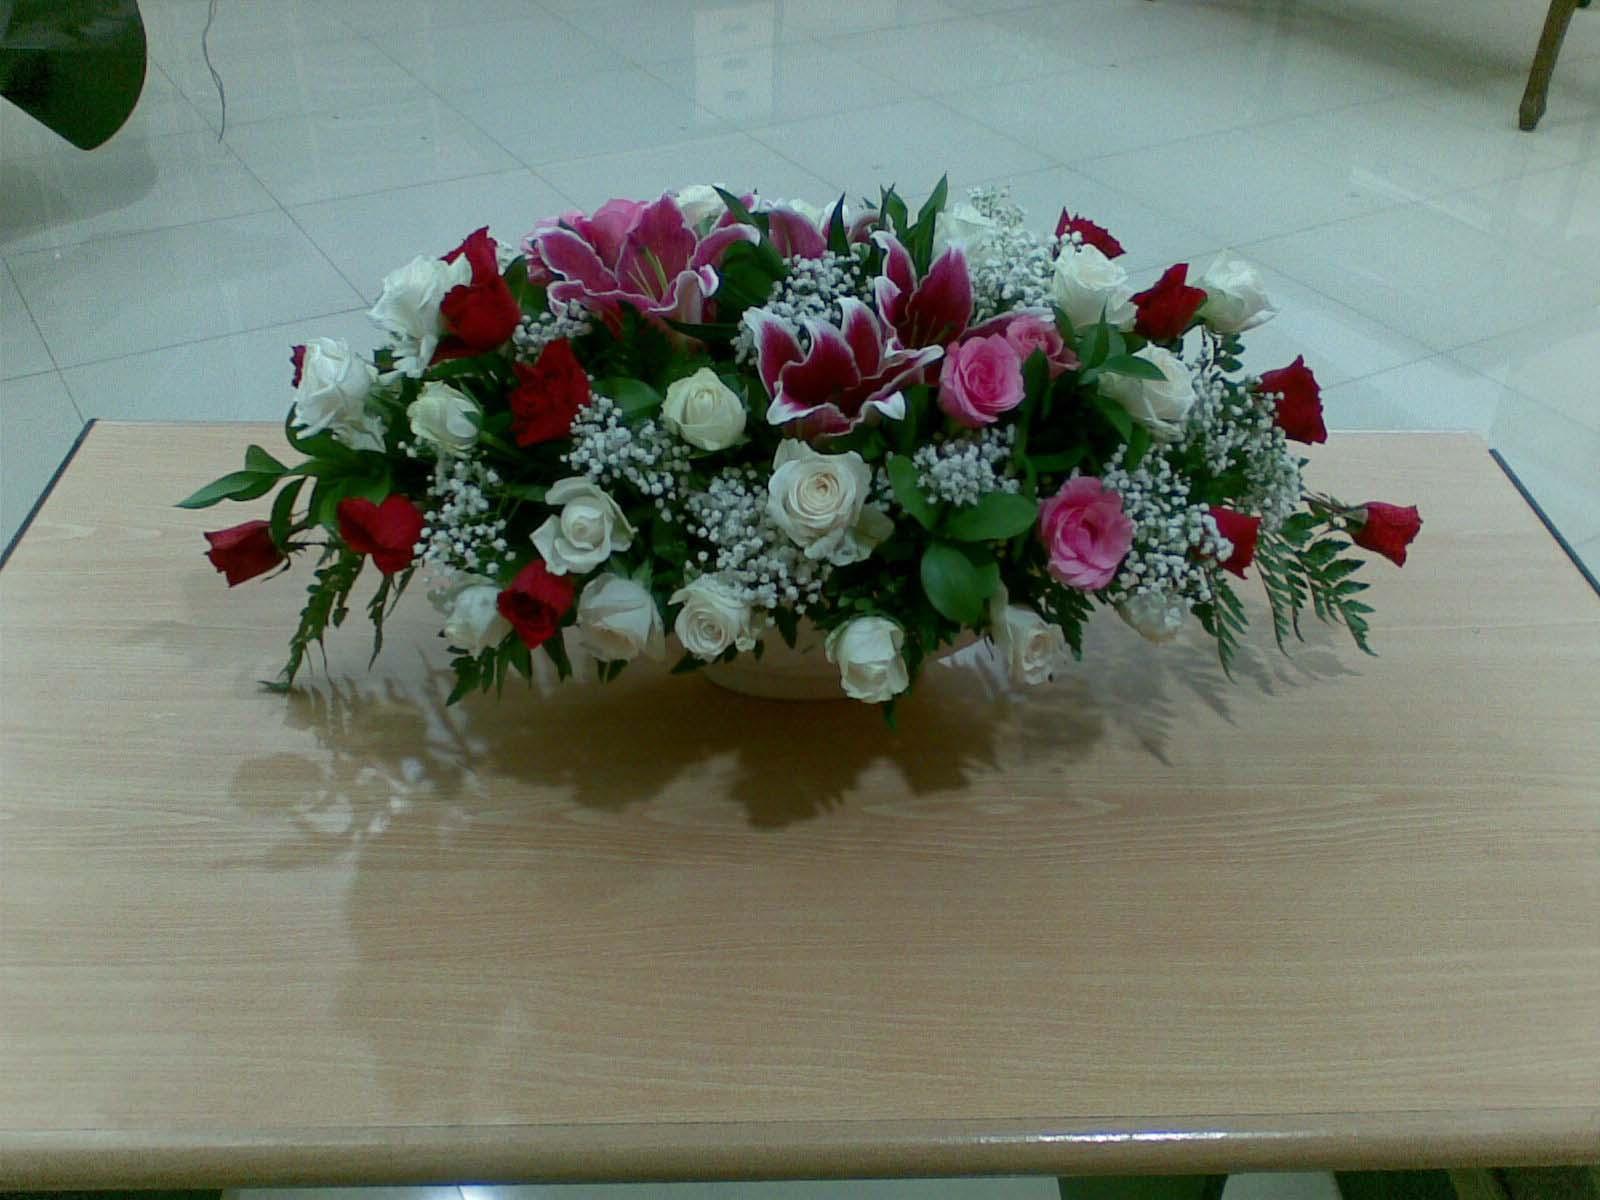 aneka bunga pajang  Alafa florist menyediakan aneka macam